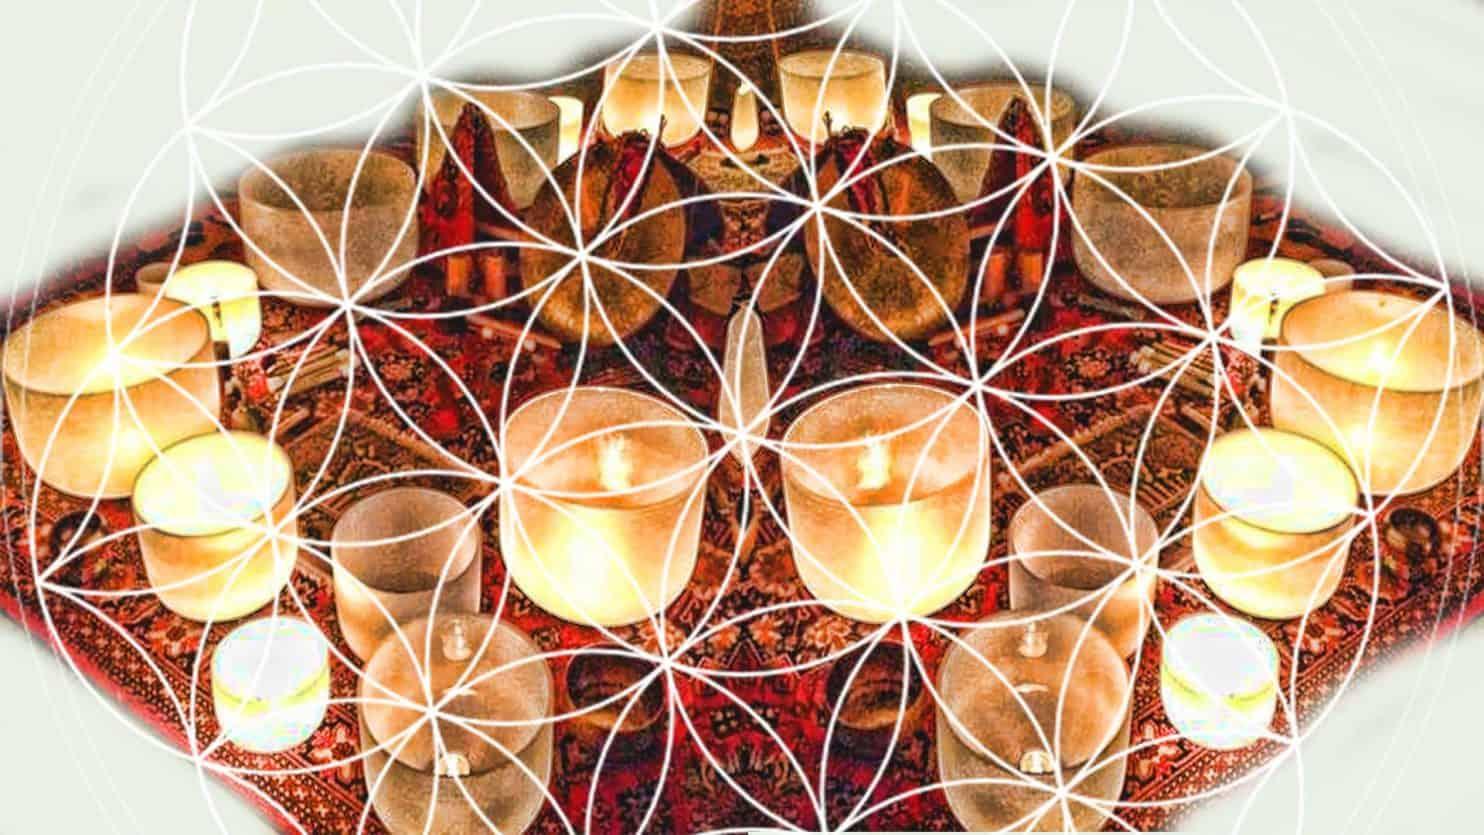 solstice jeremy sills crystal singing bowls